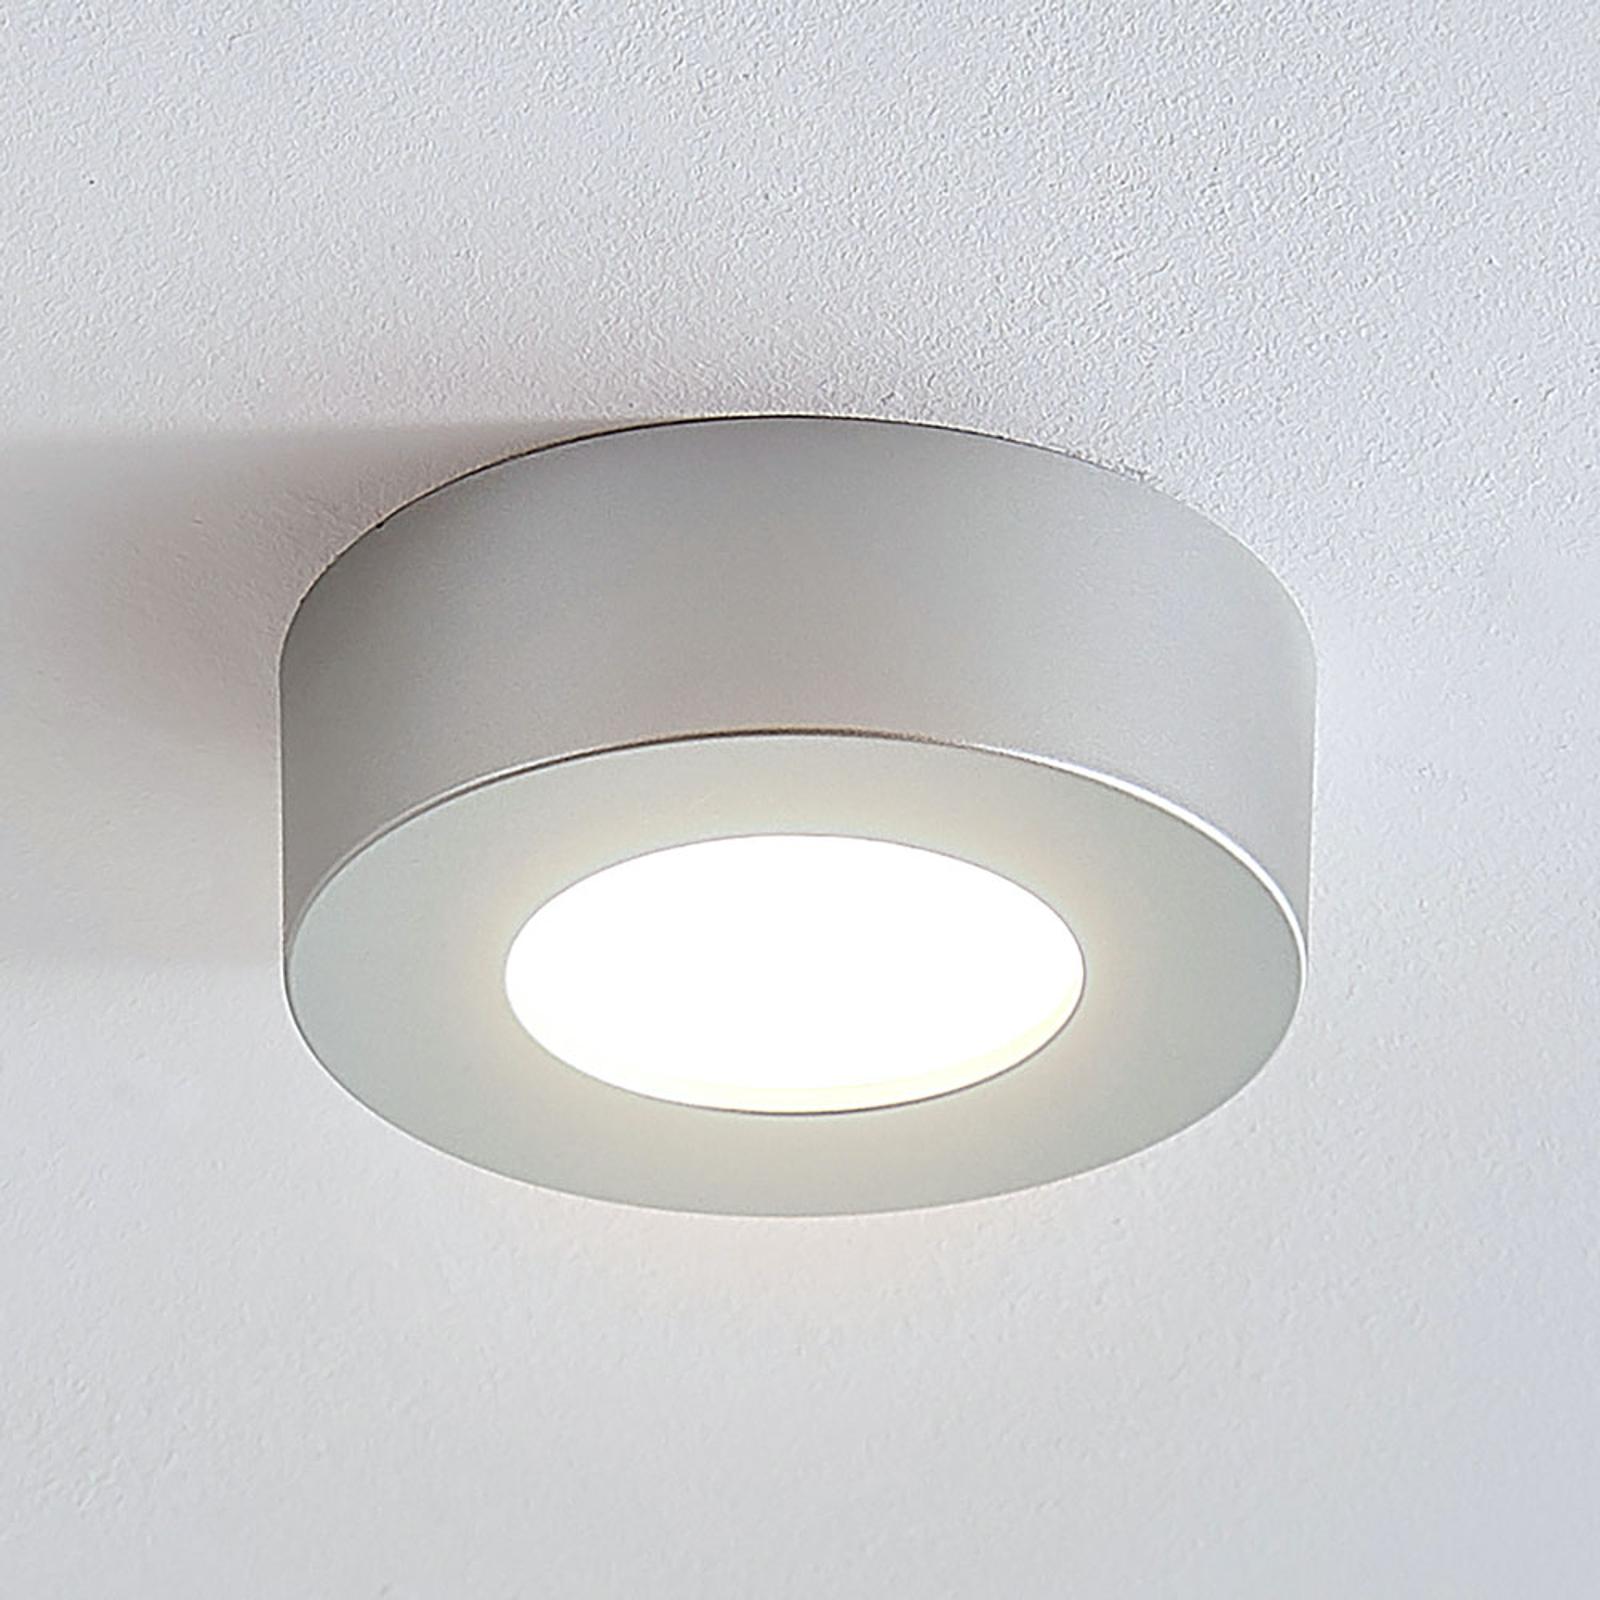 LED-taklampe Marlo sølv 3 000K rund 12,8cm